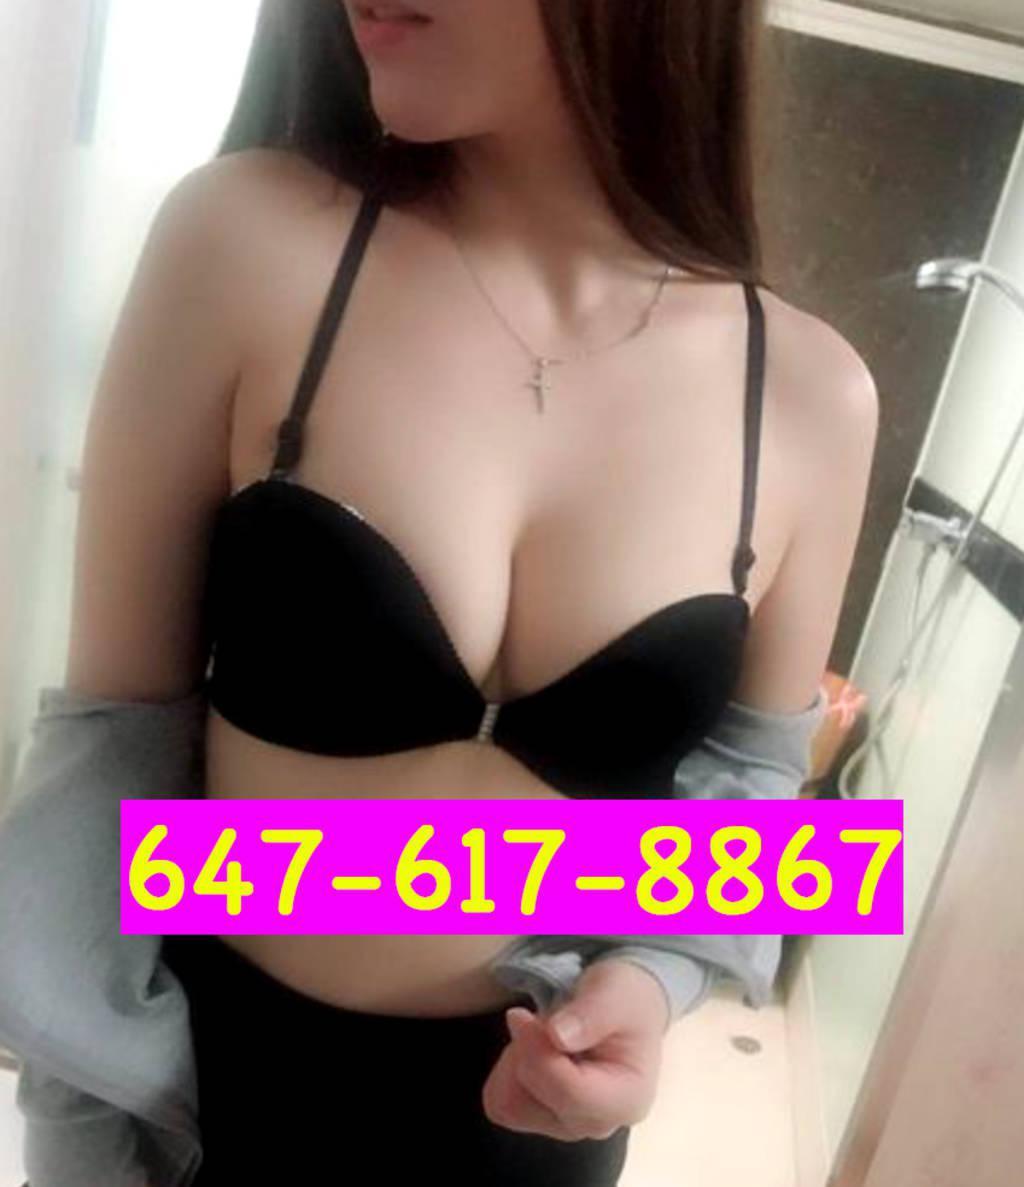 647-617-8867